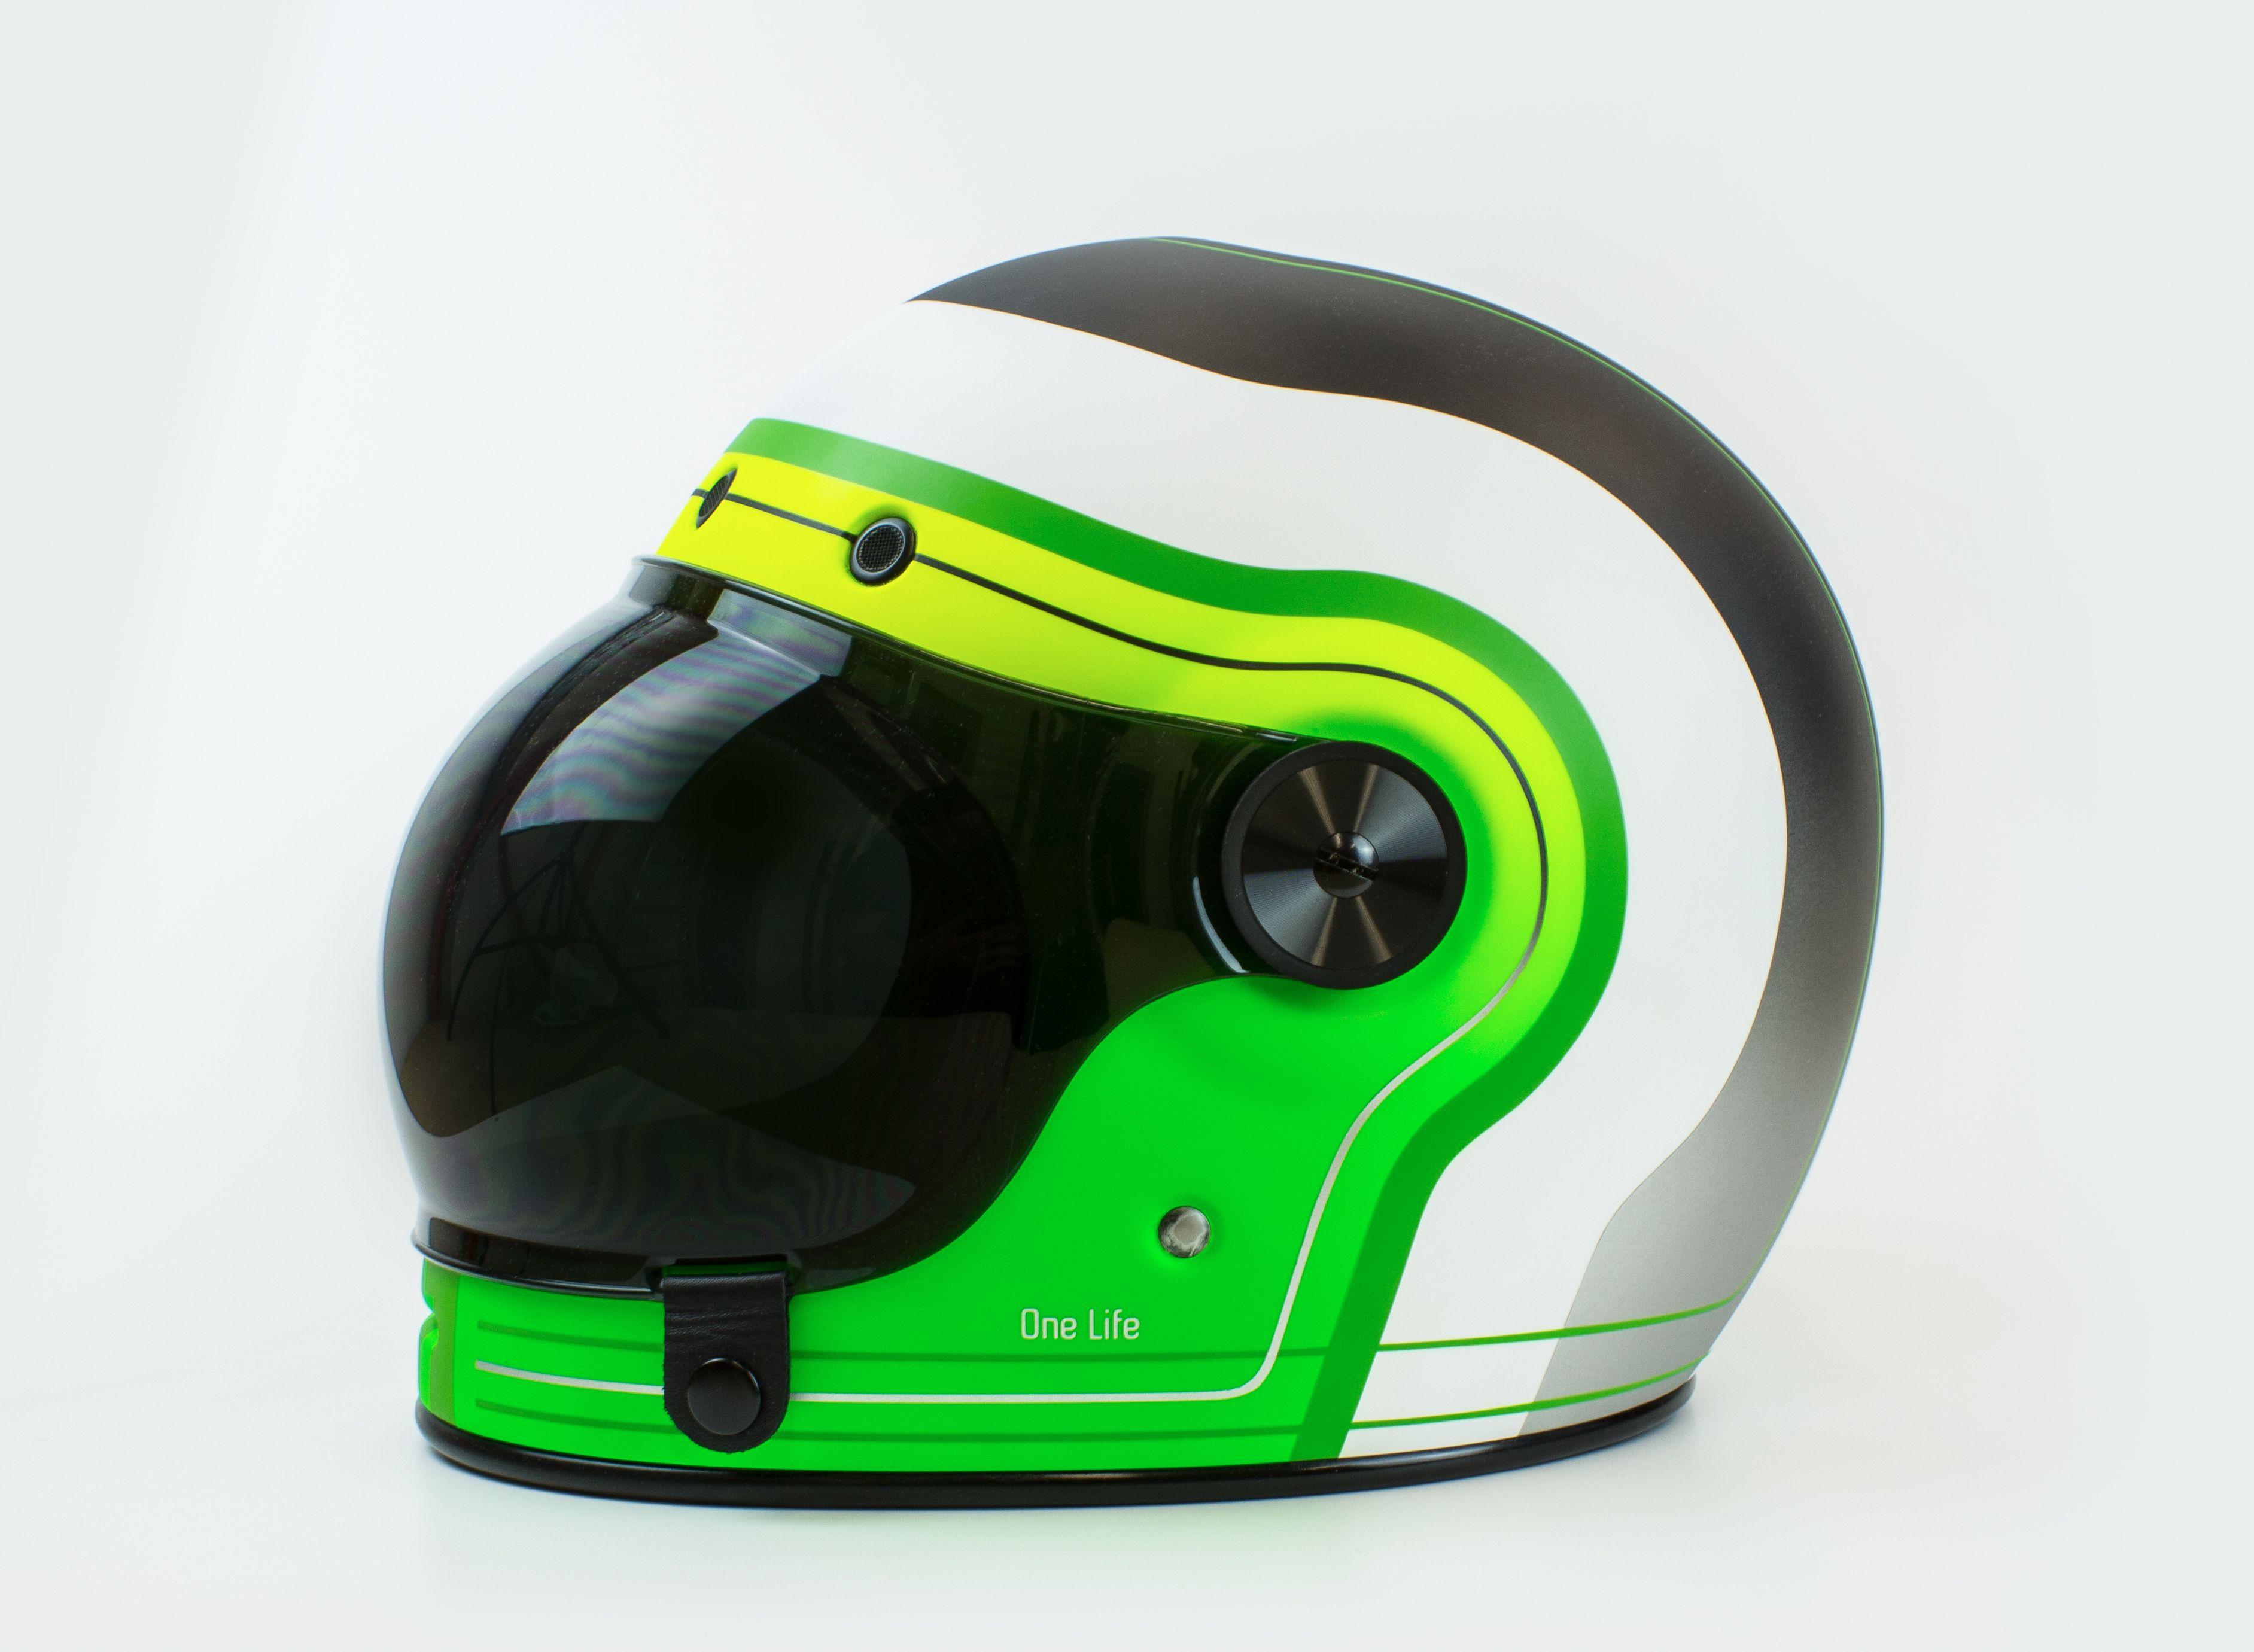 Helmade Bell Bullitt 101 Vintage Integral Helmet For Glemseck101 In Germany Get Yourself An Own Custom Painted Helm Helmet Design Helmet Paint Helmet